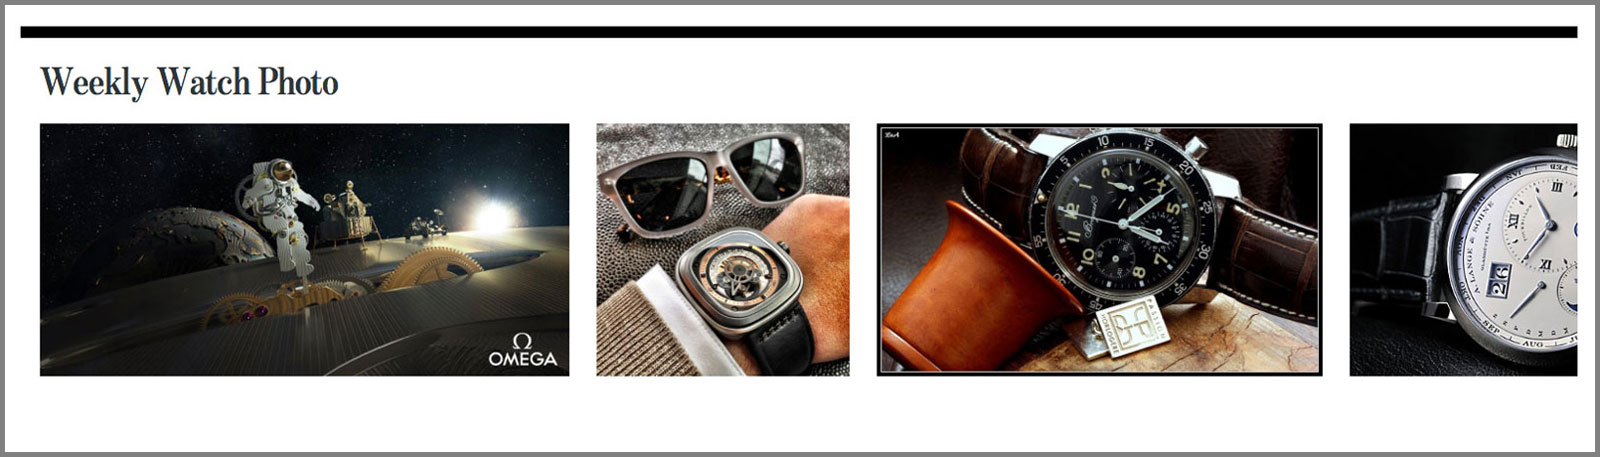 Monochrome weekly watch photo